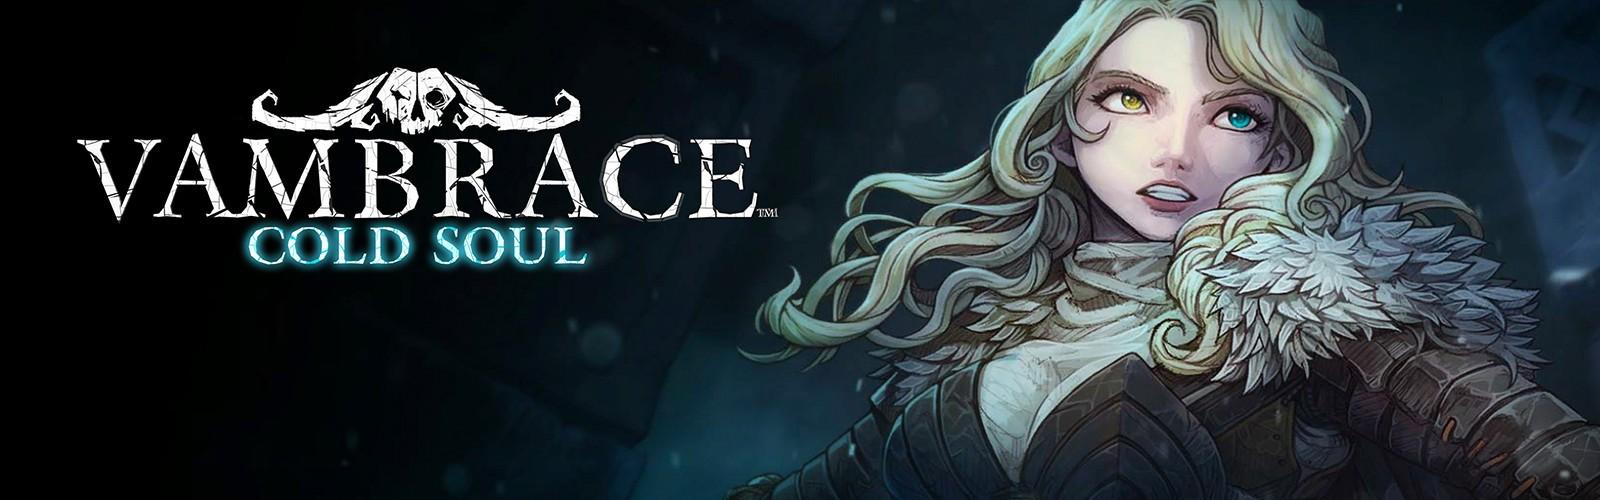 Vambrace: Cold Soul Steam Key GLOBAL